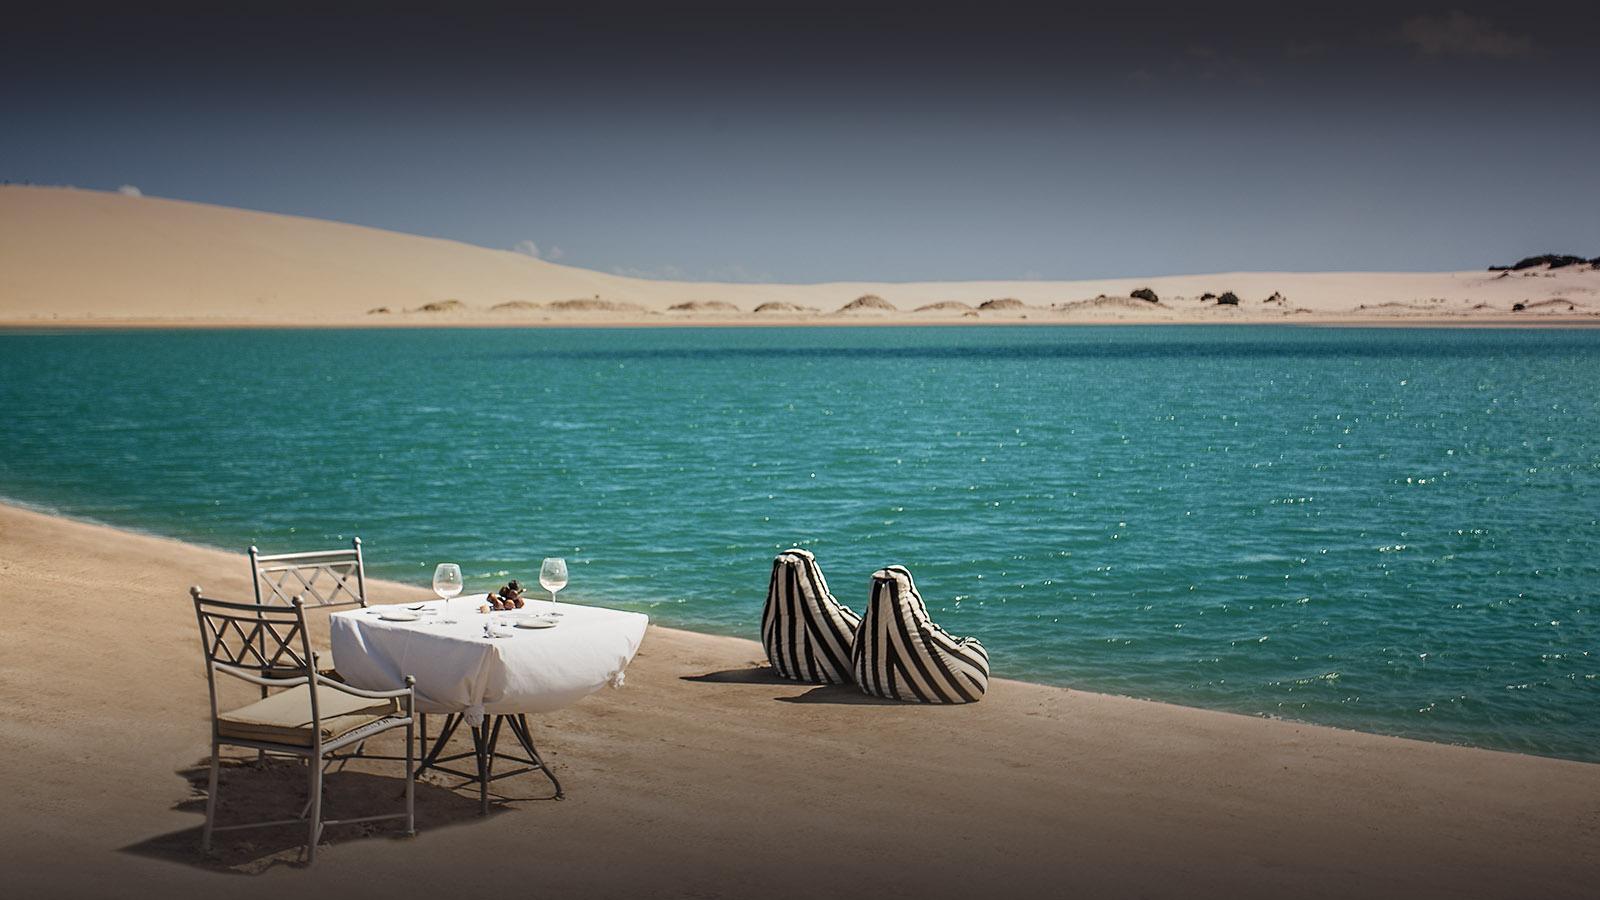 anantara bazaruto mozambique-lodges-zambia-in-style-luxury-bazaruto-island-beach-picnics